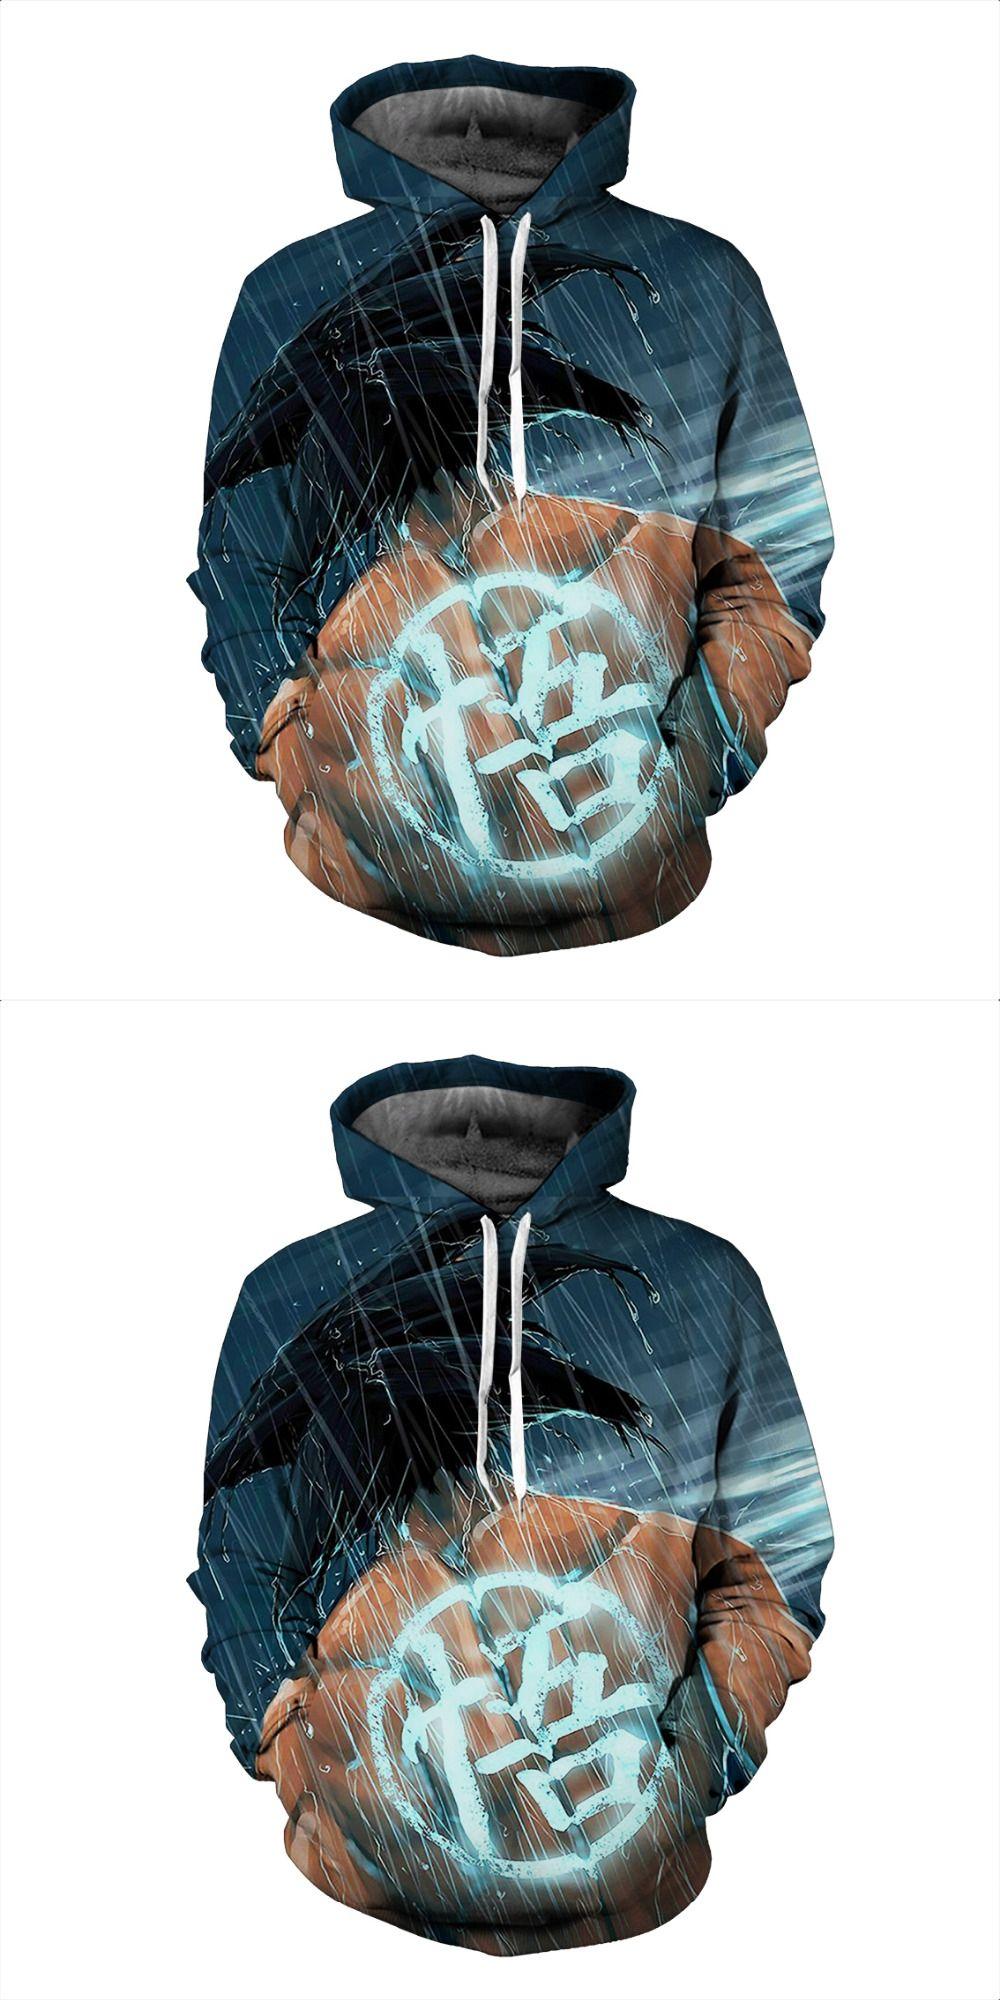 bcd7856fdb0 2017 sweatshirt Hoodies Men women Cool creative 3D print Dragon Ball Rainy  day fashion hot Style